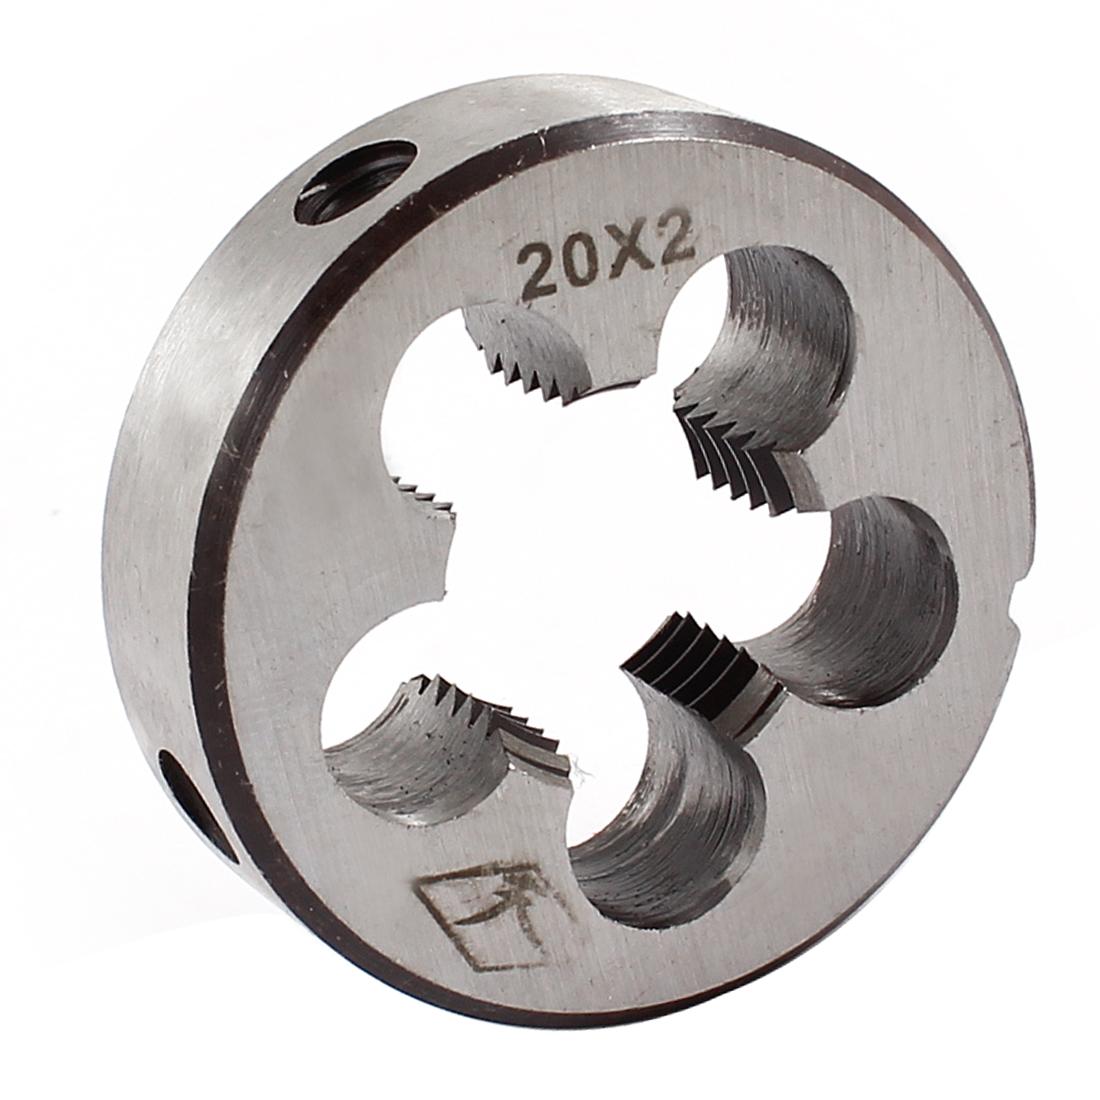 M20 45mm Outside Diameter Hand Machine Circular Screwing Die Gray